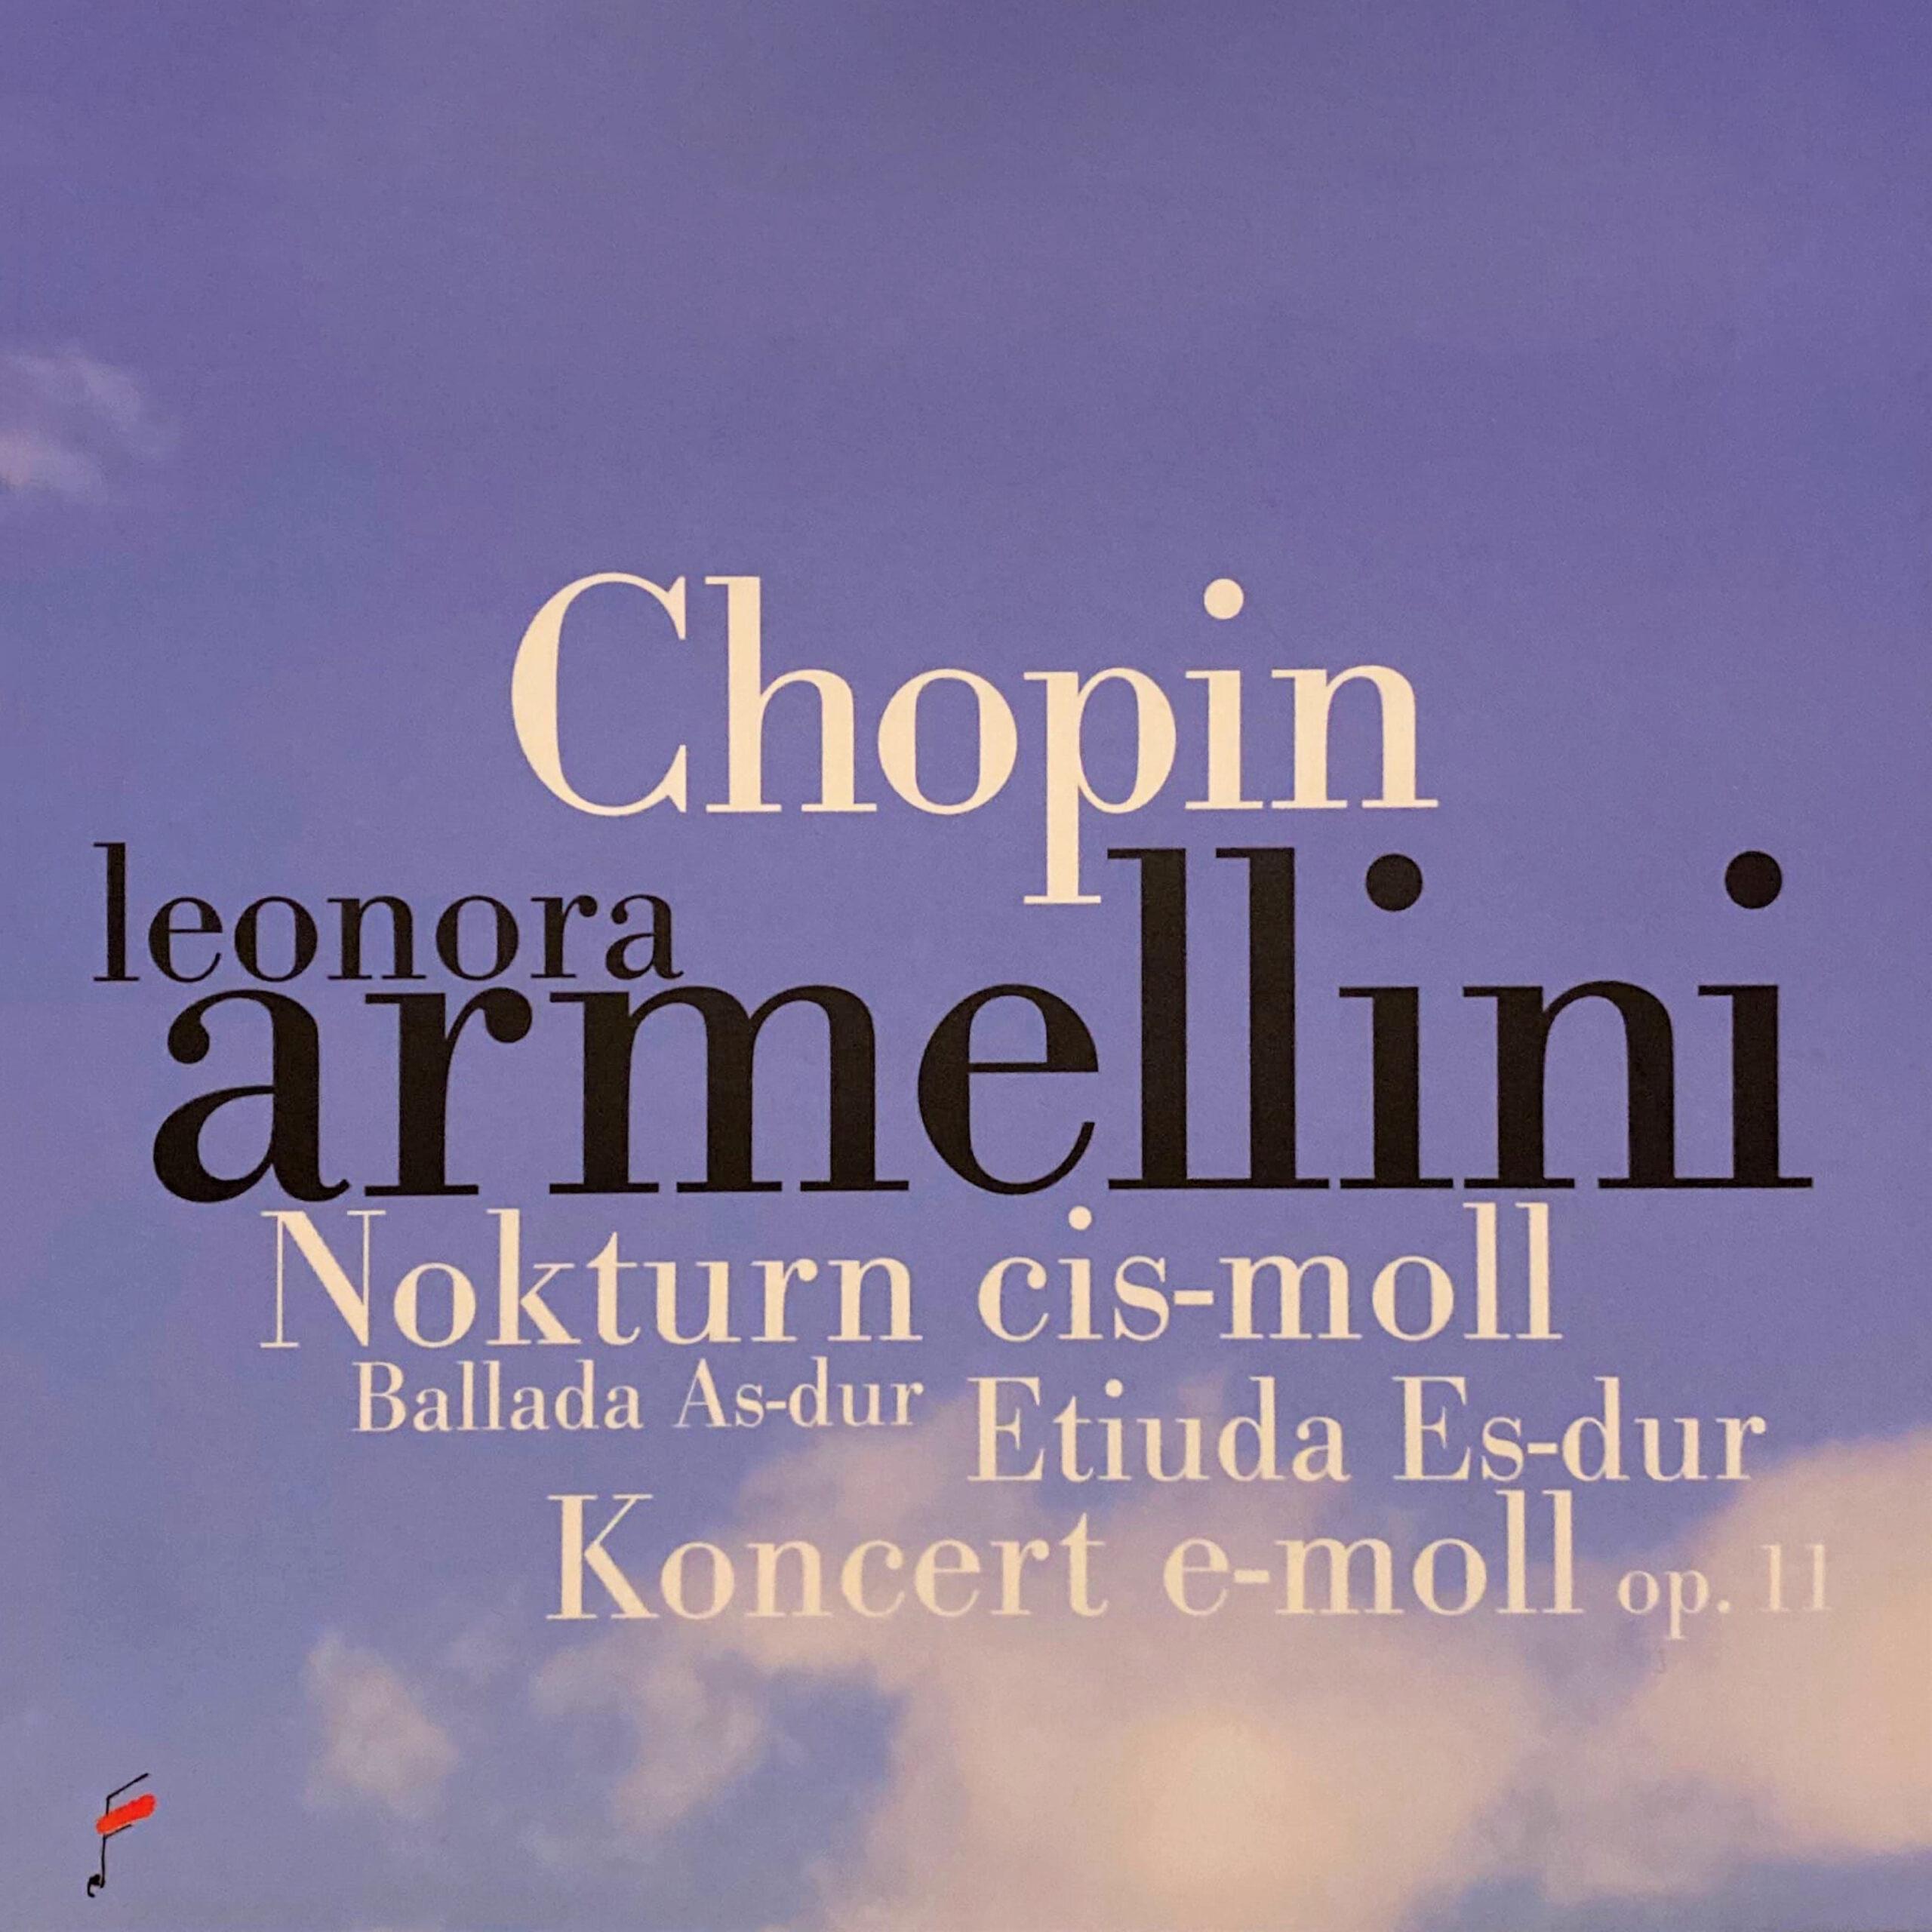 Leonora Armellini Discography_Chopin Competition